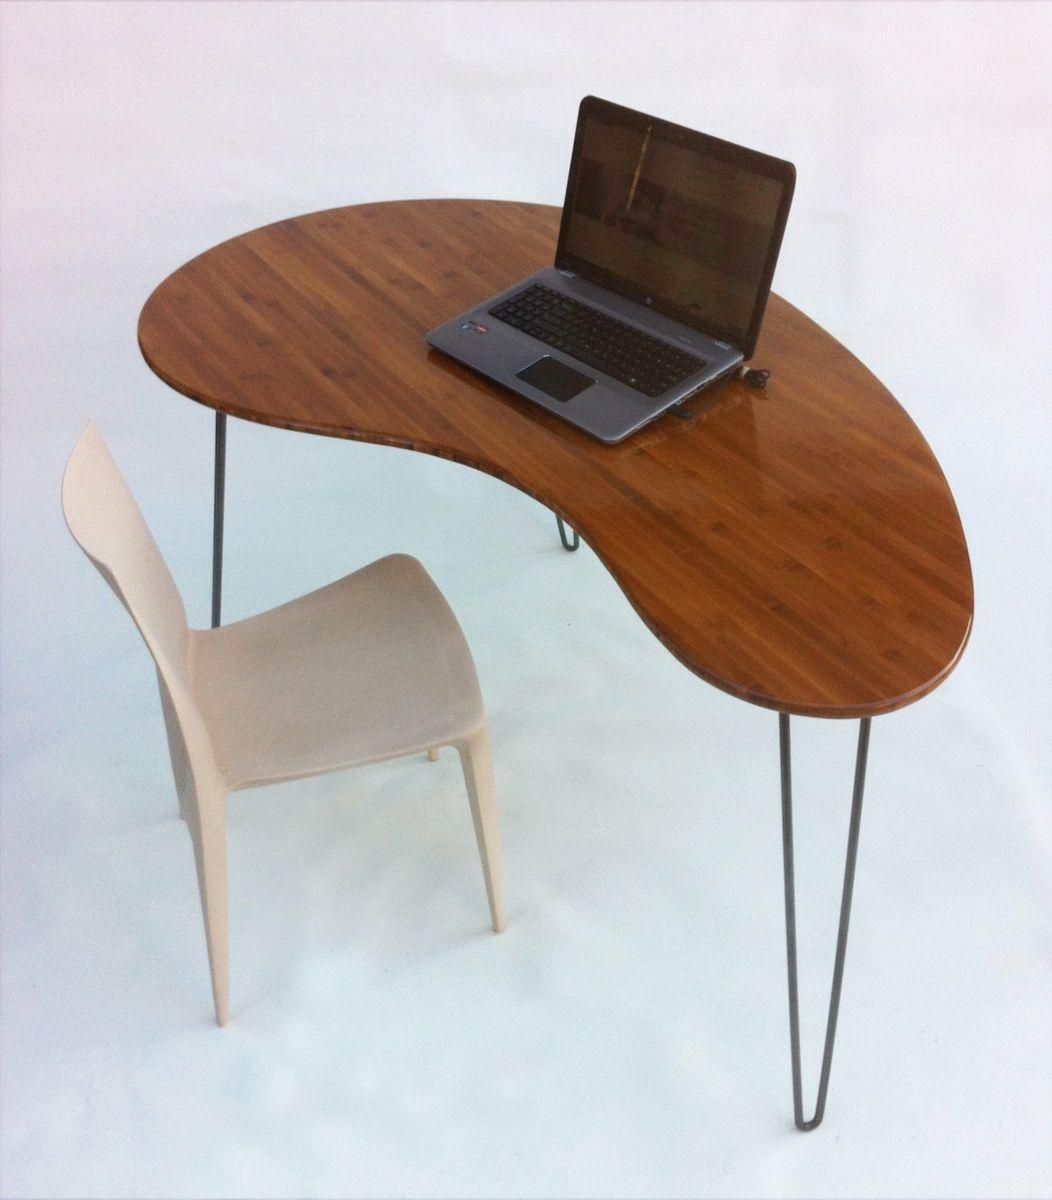 Custom Made Kidney Bean Shaped Modern Desk Atomic Era Boomerang Design In Caramelized Bamboo